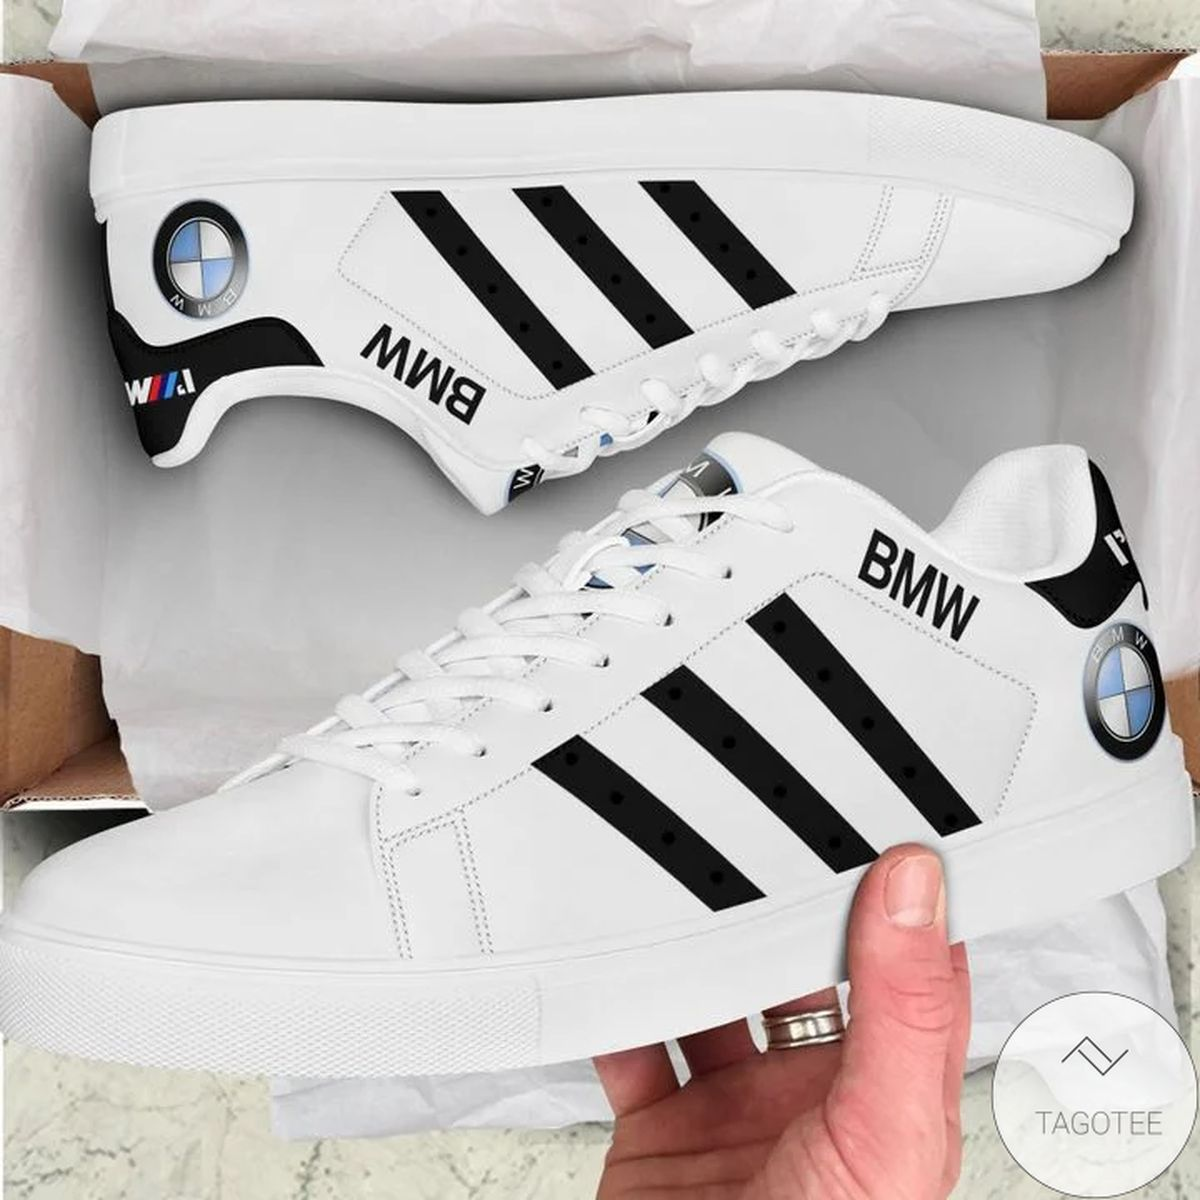 3D Bmw Stan Smith Shoes